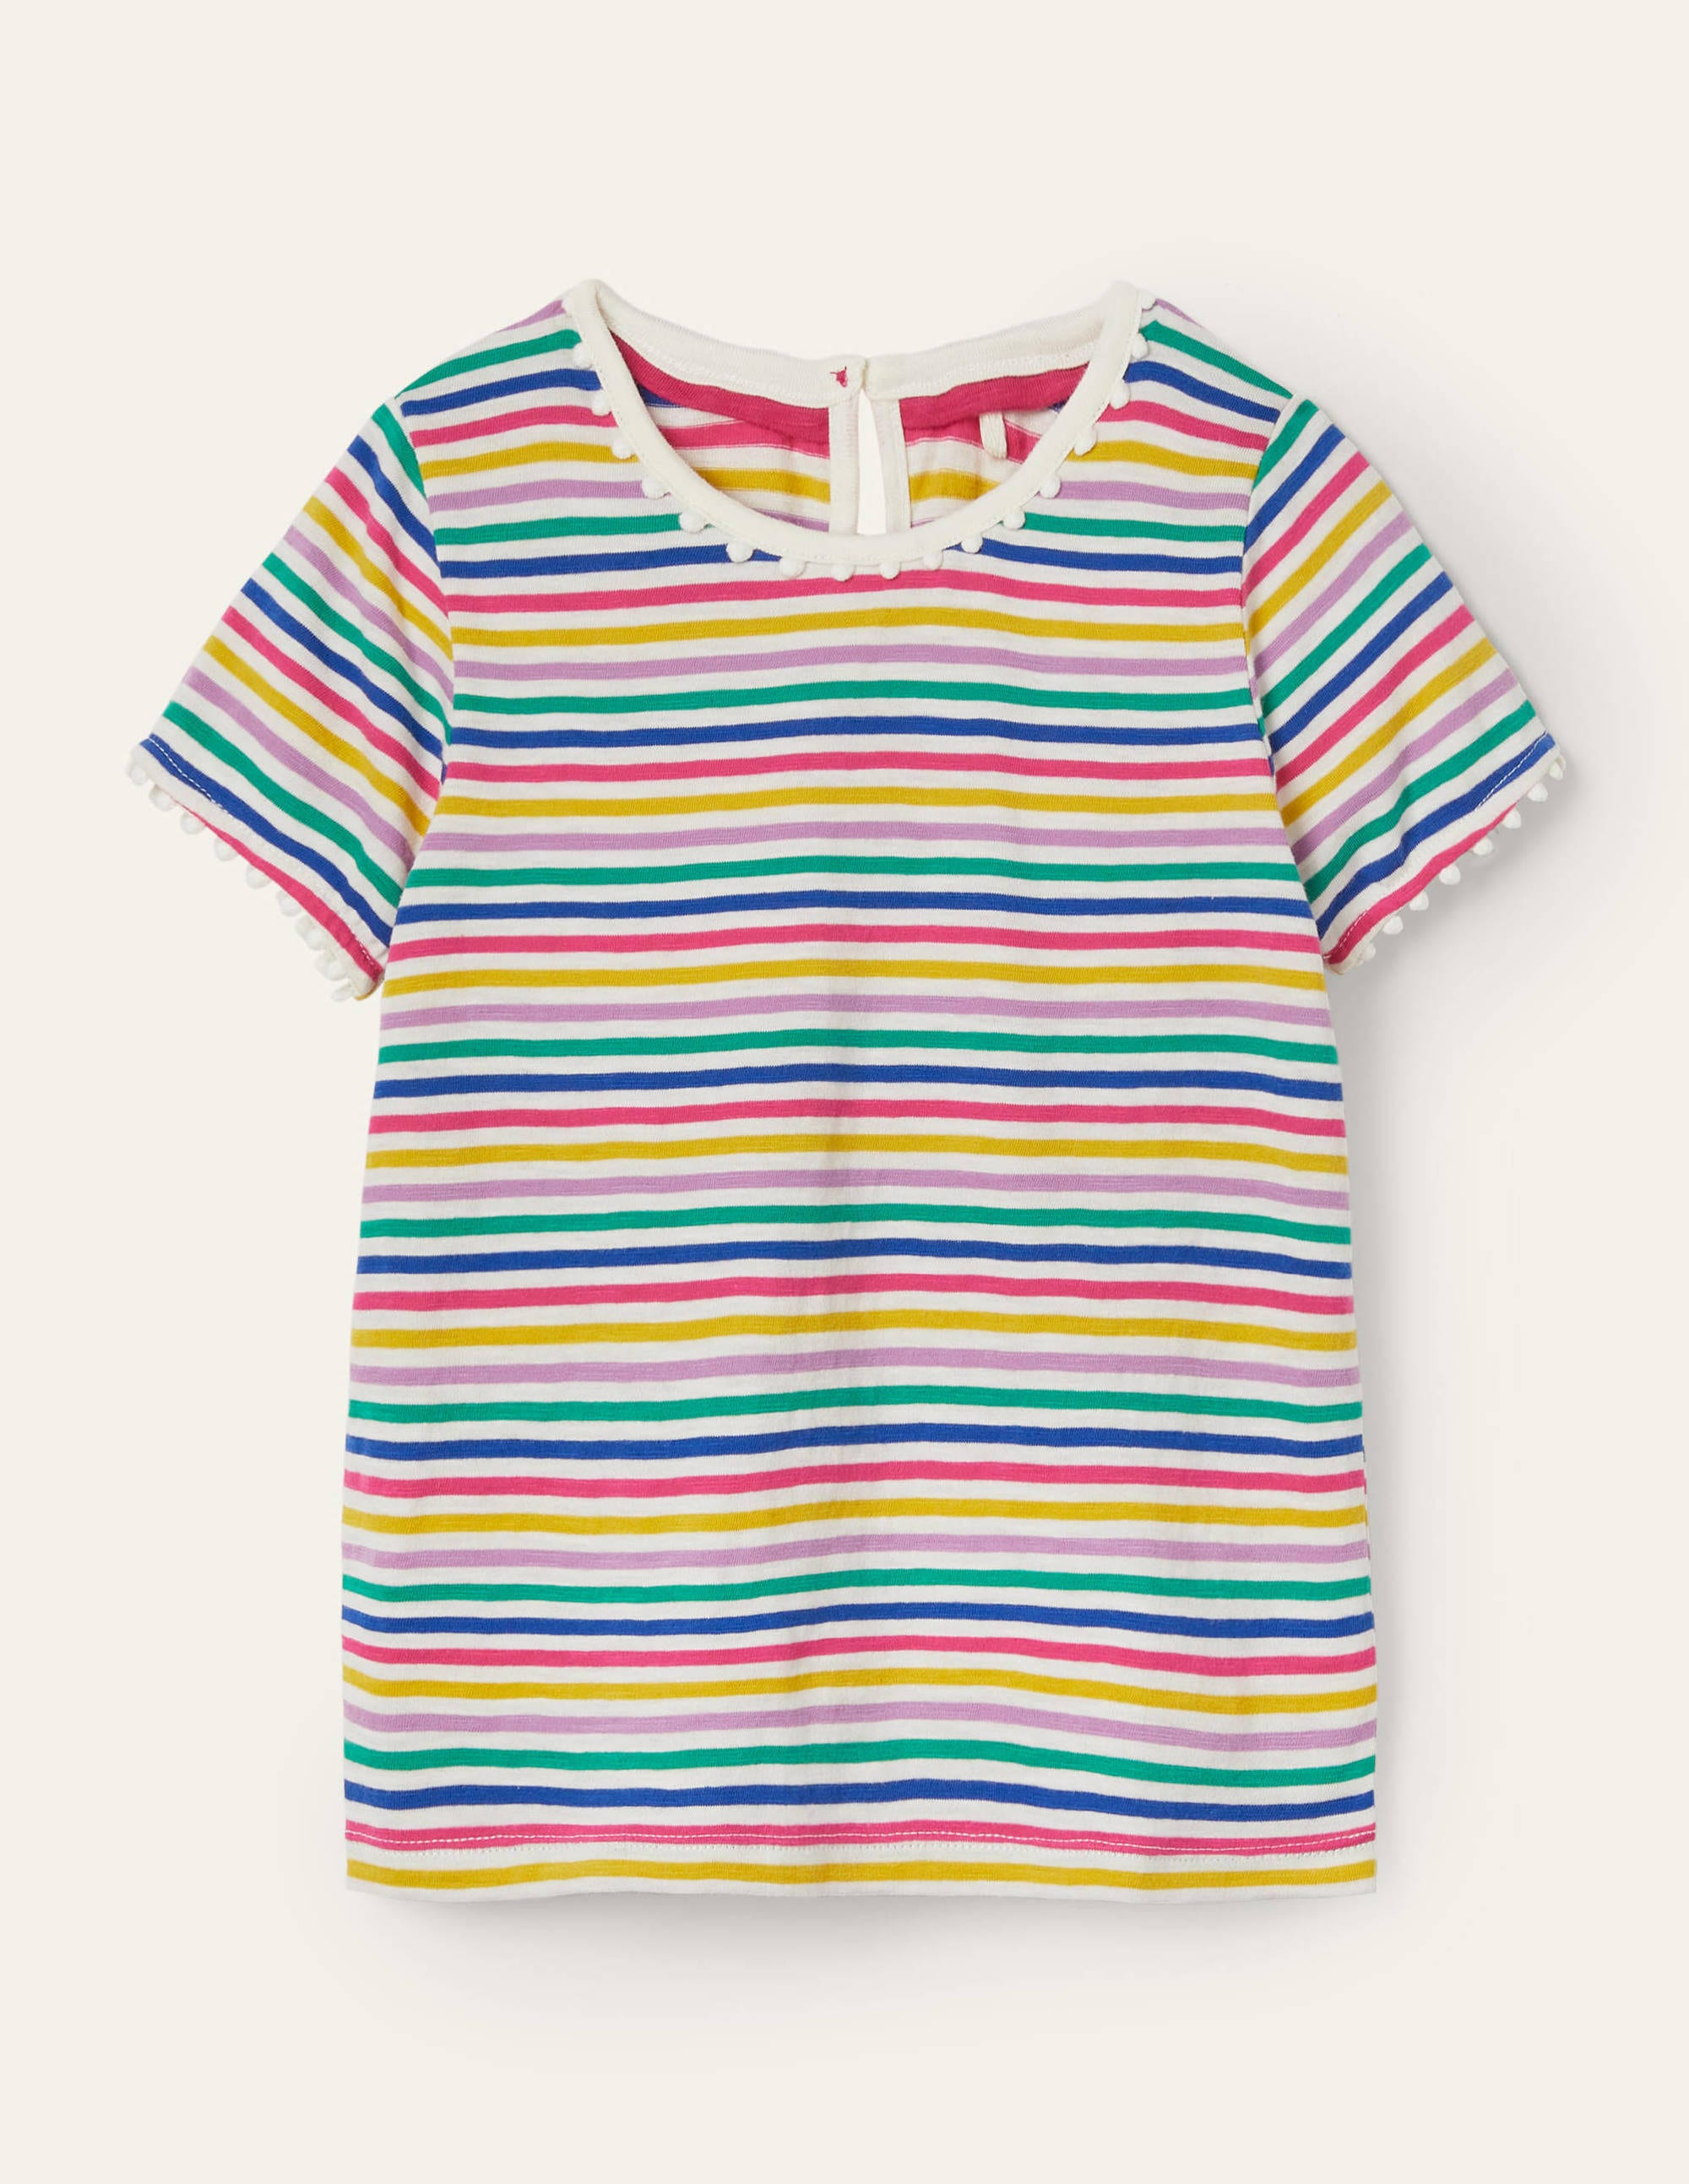 Boden Charlie Pom Jersey T-shirt - Multi Stripe